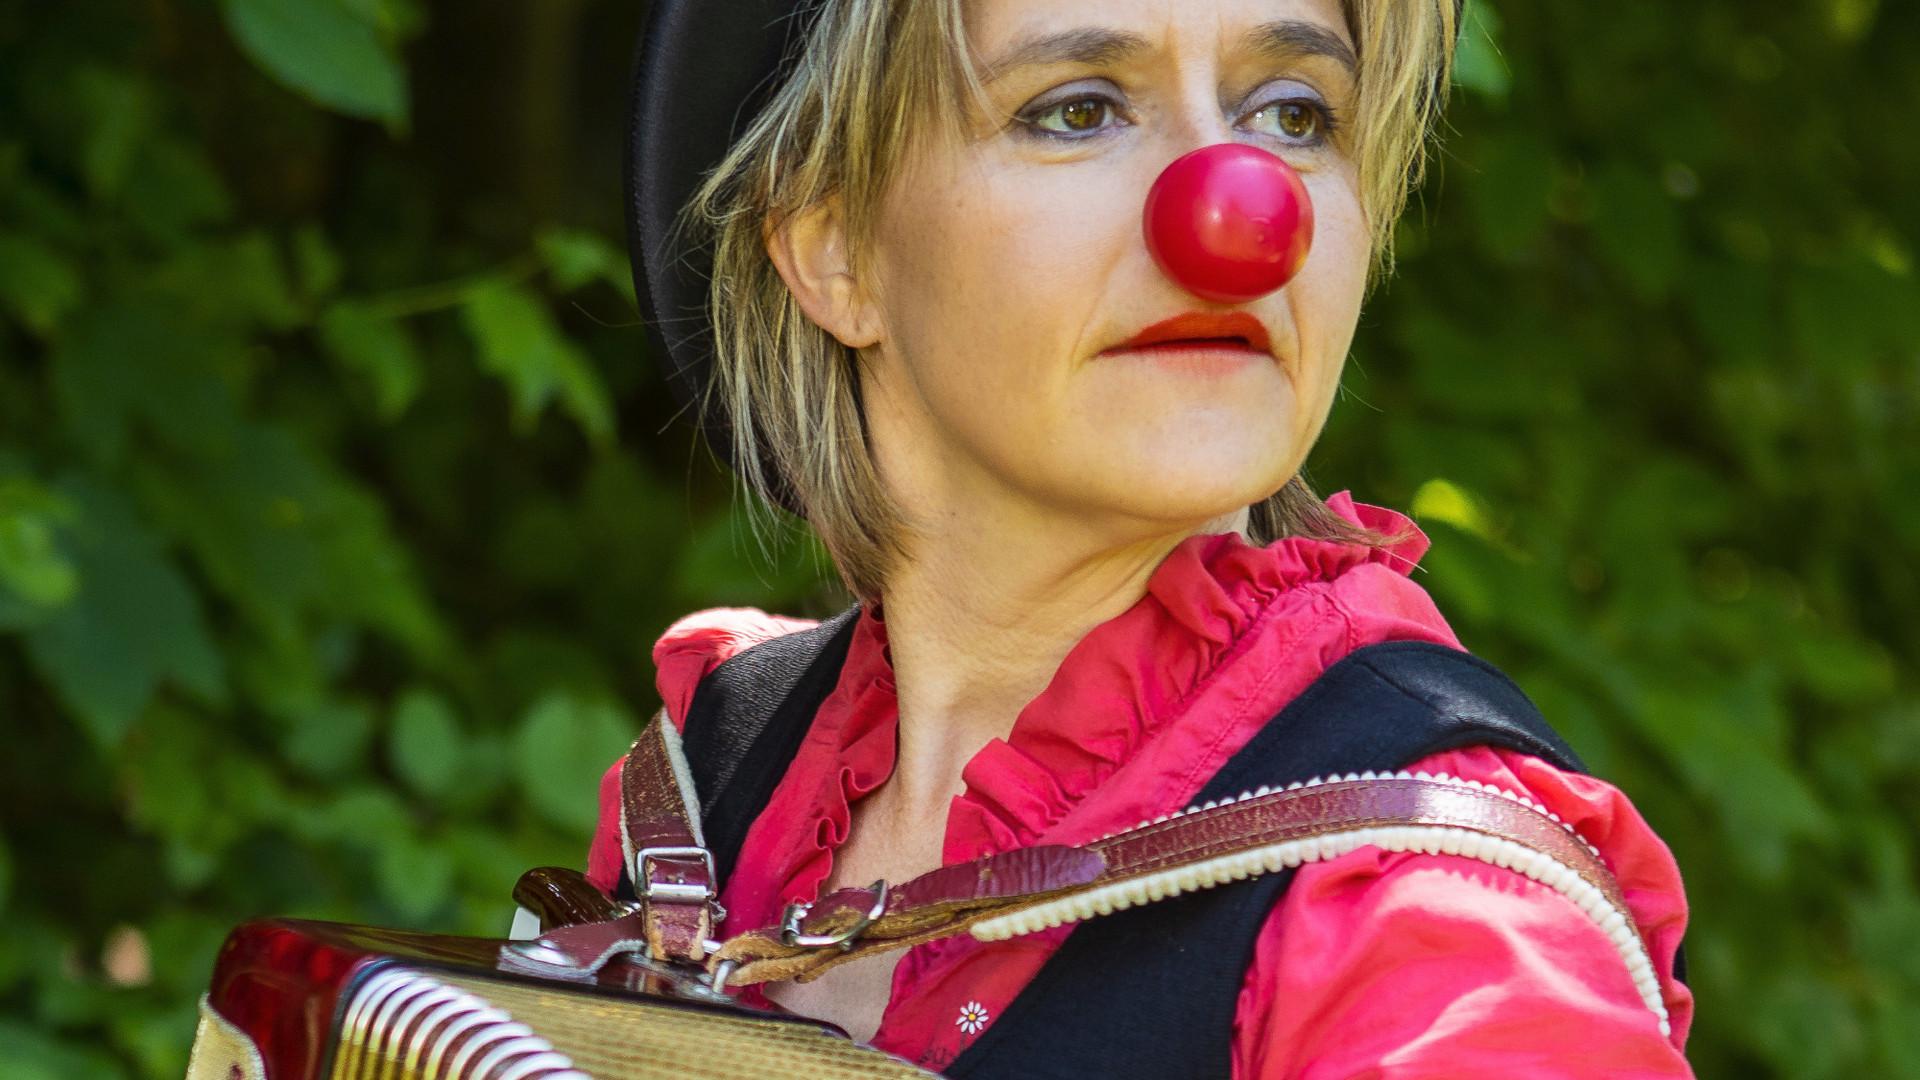 Clown-Bearbeitet%20(2)_edited.jpg